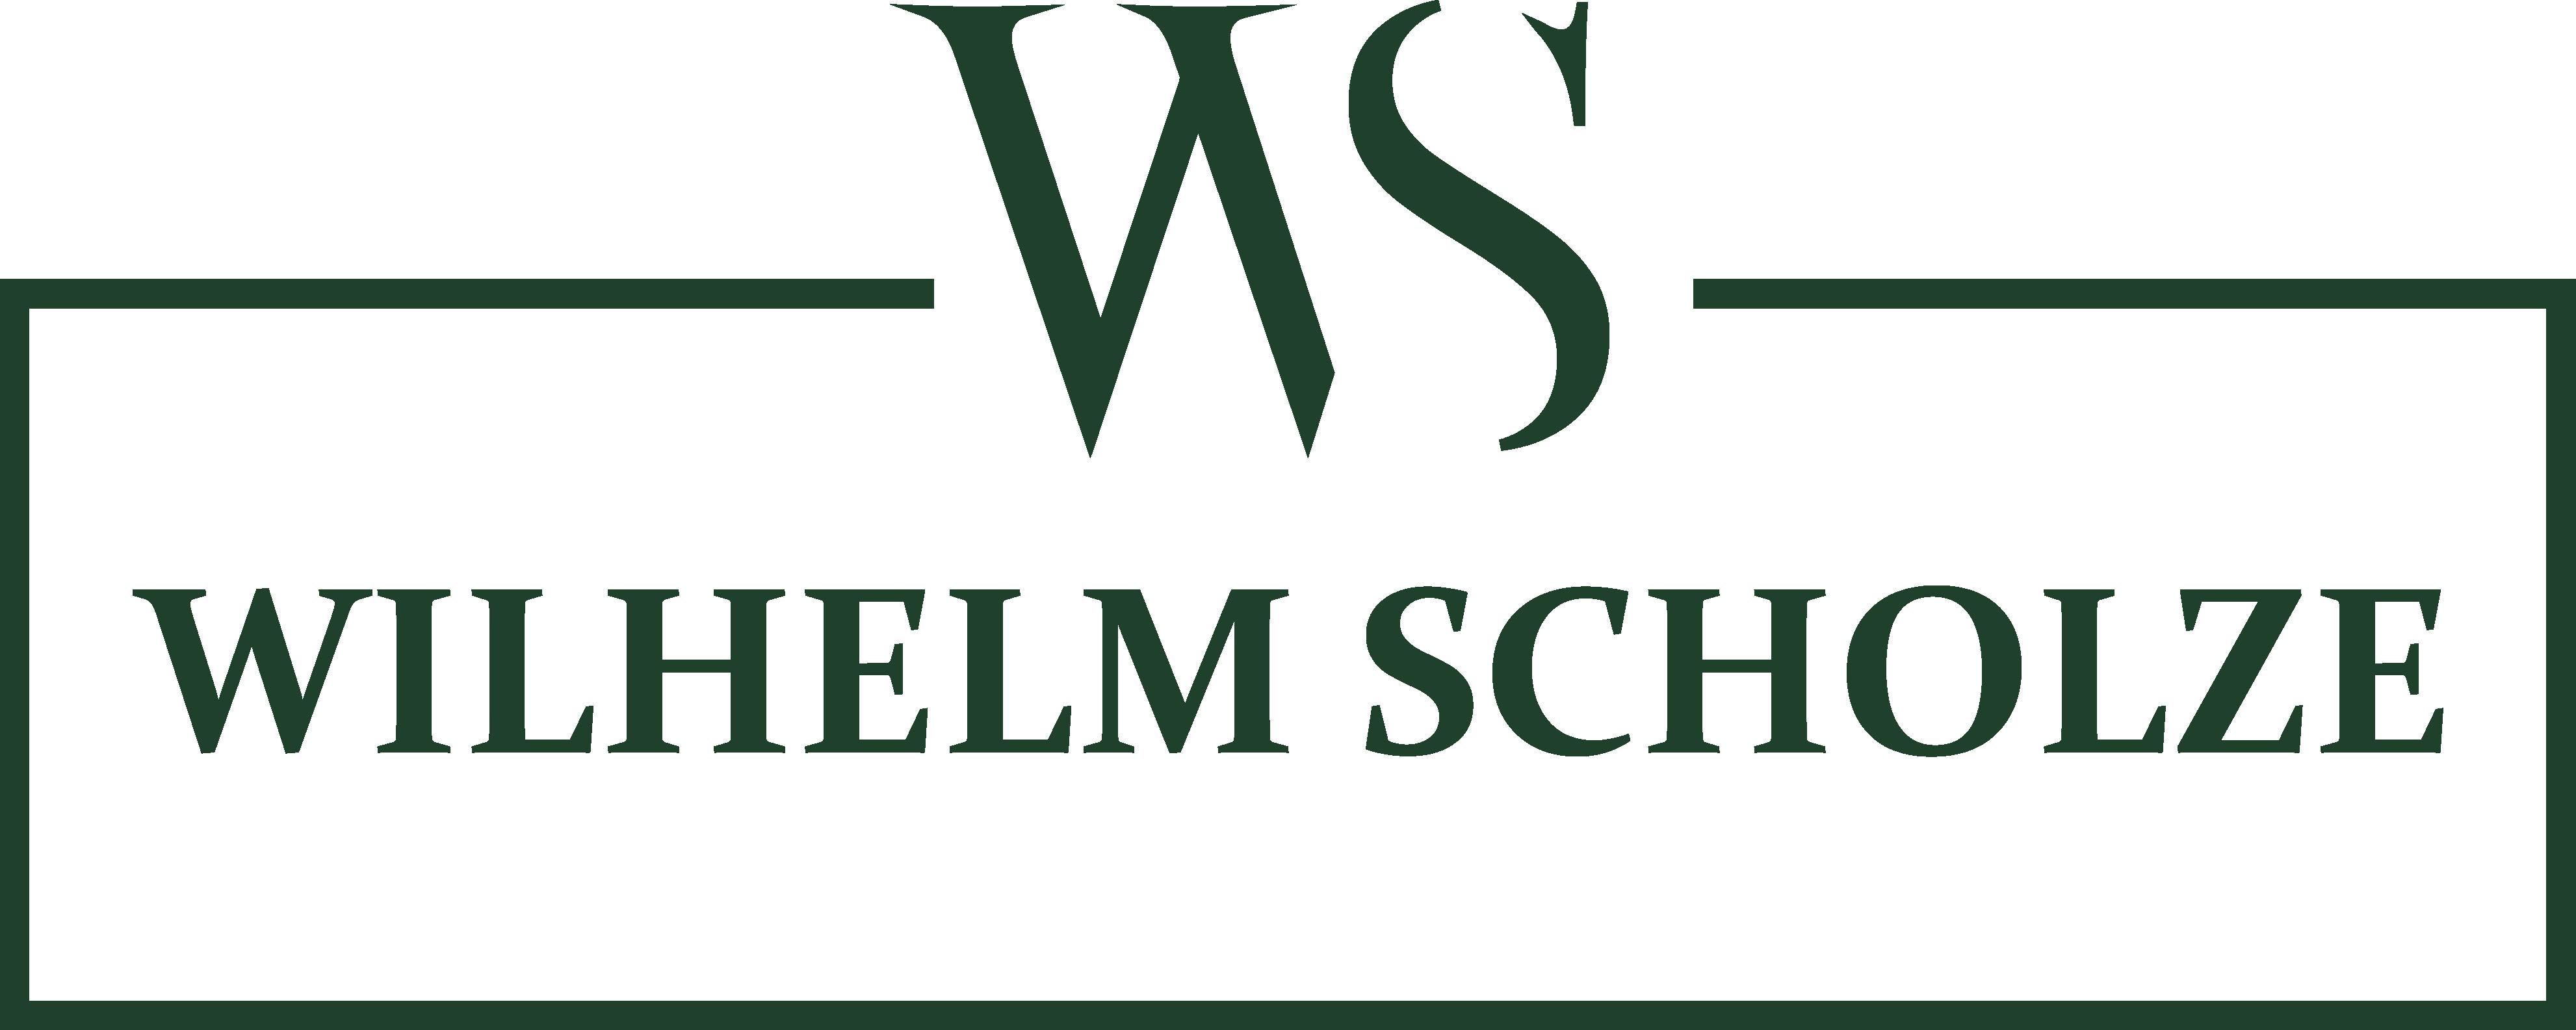 Wilhelm Scholze Logo